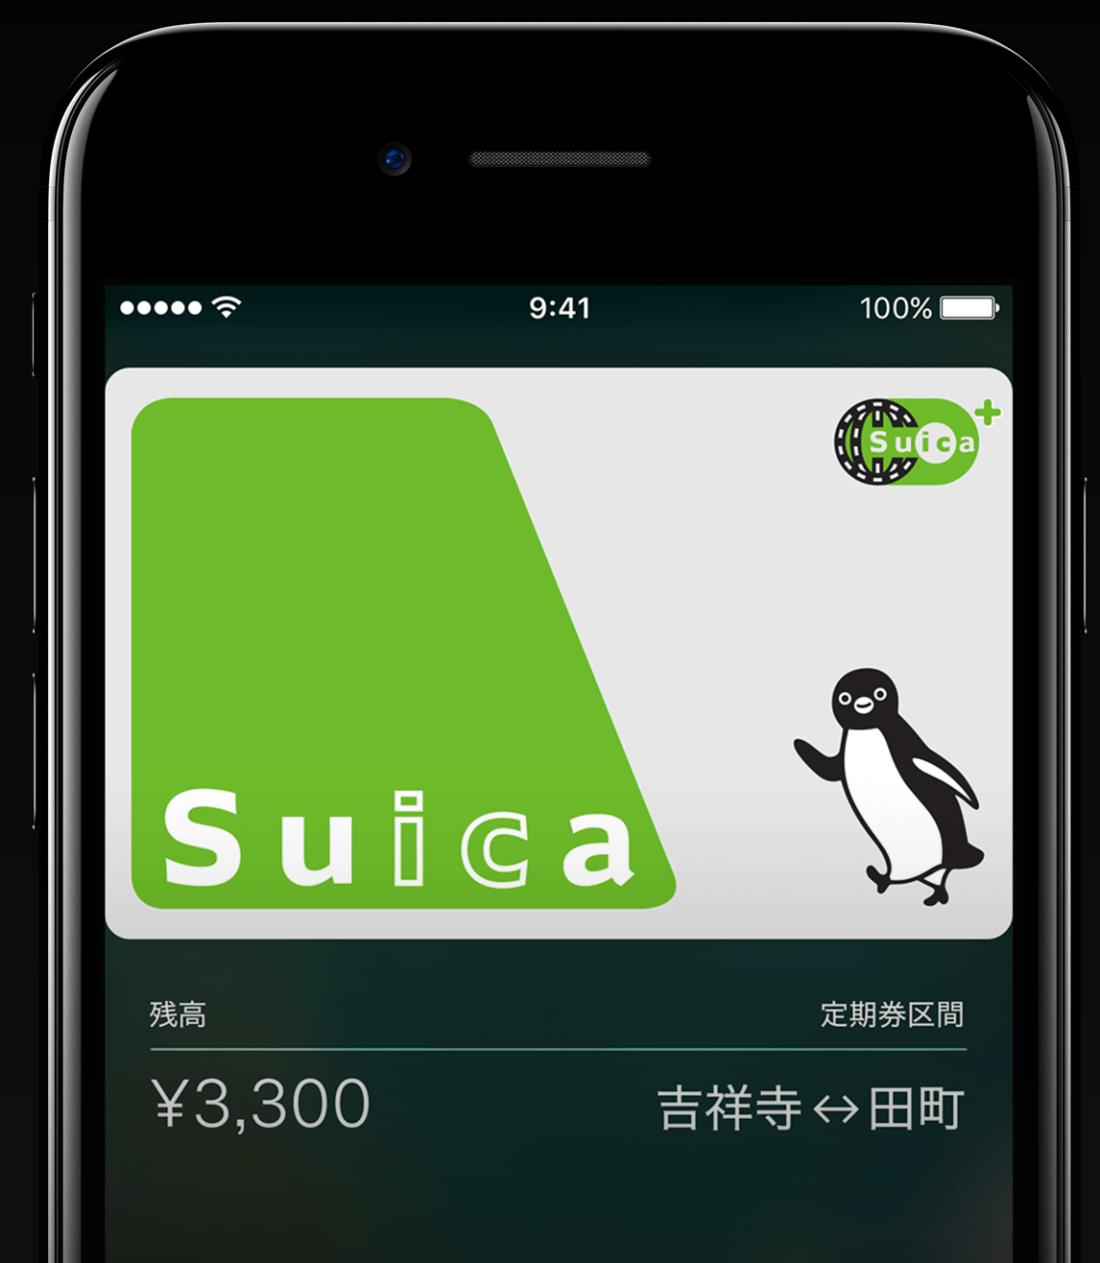 Black Suica